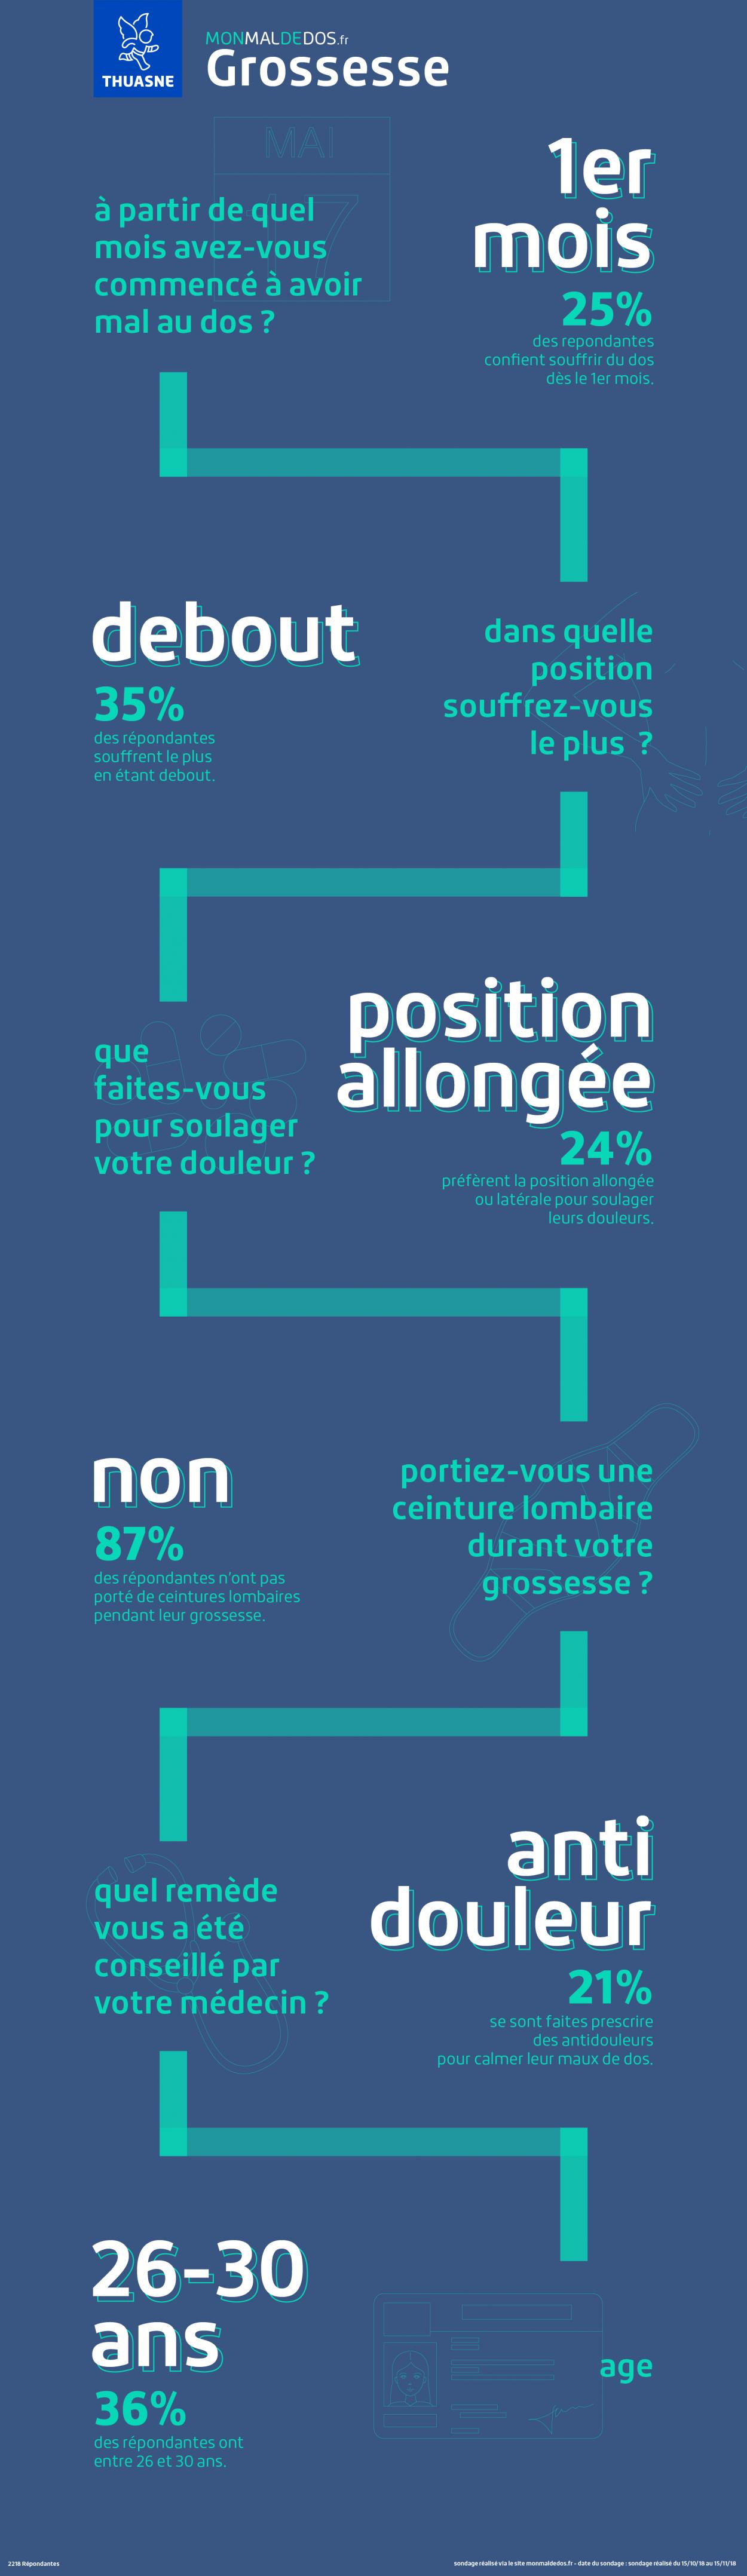 Infographie grossesse et mal de dos   monmaldedos.fr